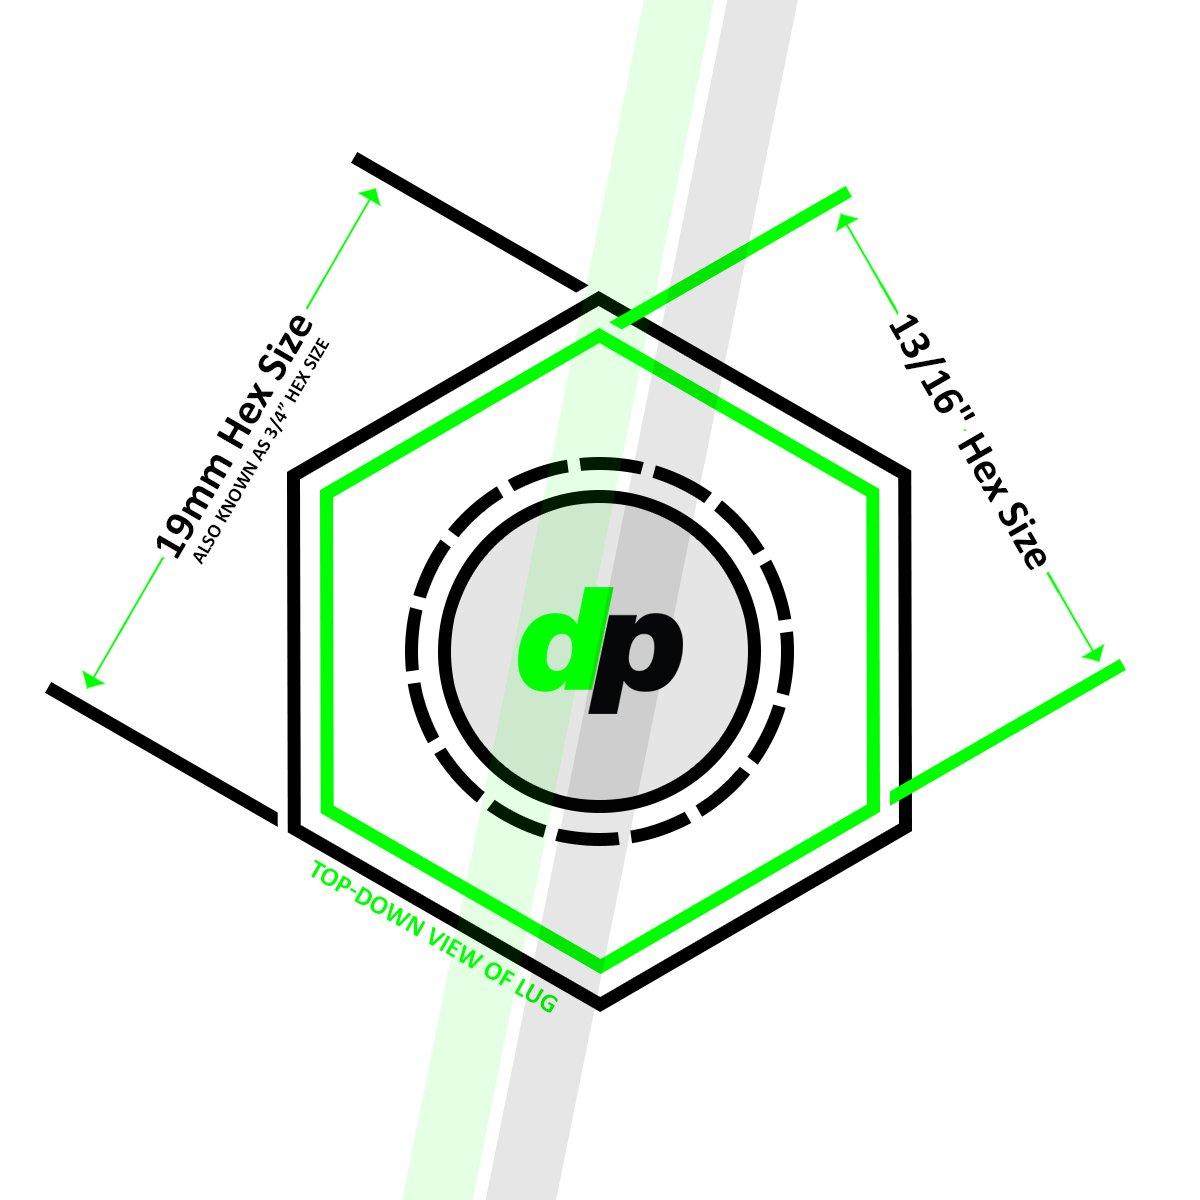 DPAccessories D5246P-2308//20 20 Black 12x1.5 Closed End Spline Tuner Lug Nuts for Aftermarket Wheels Wheel Lug Nut